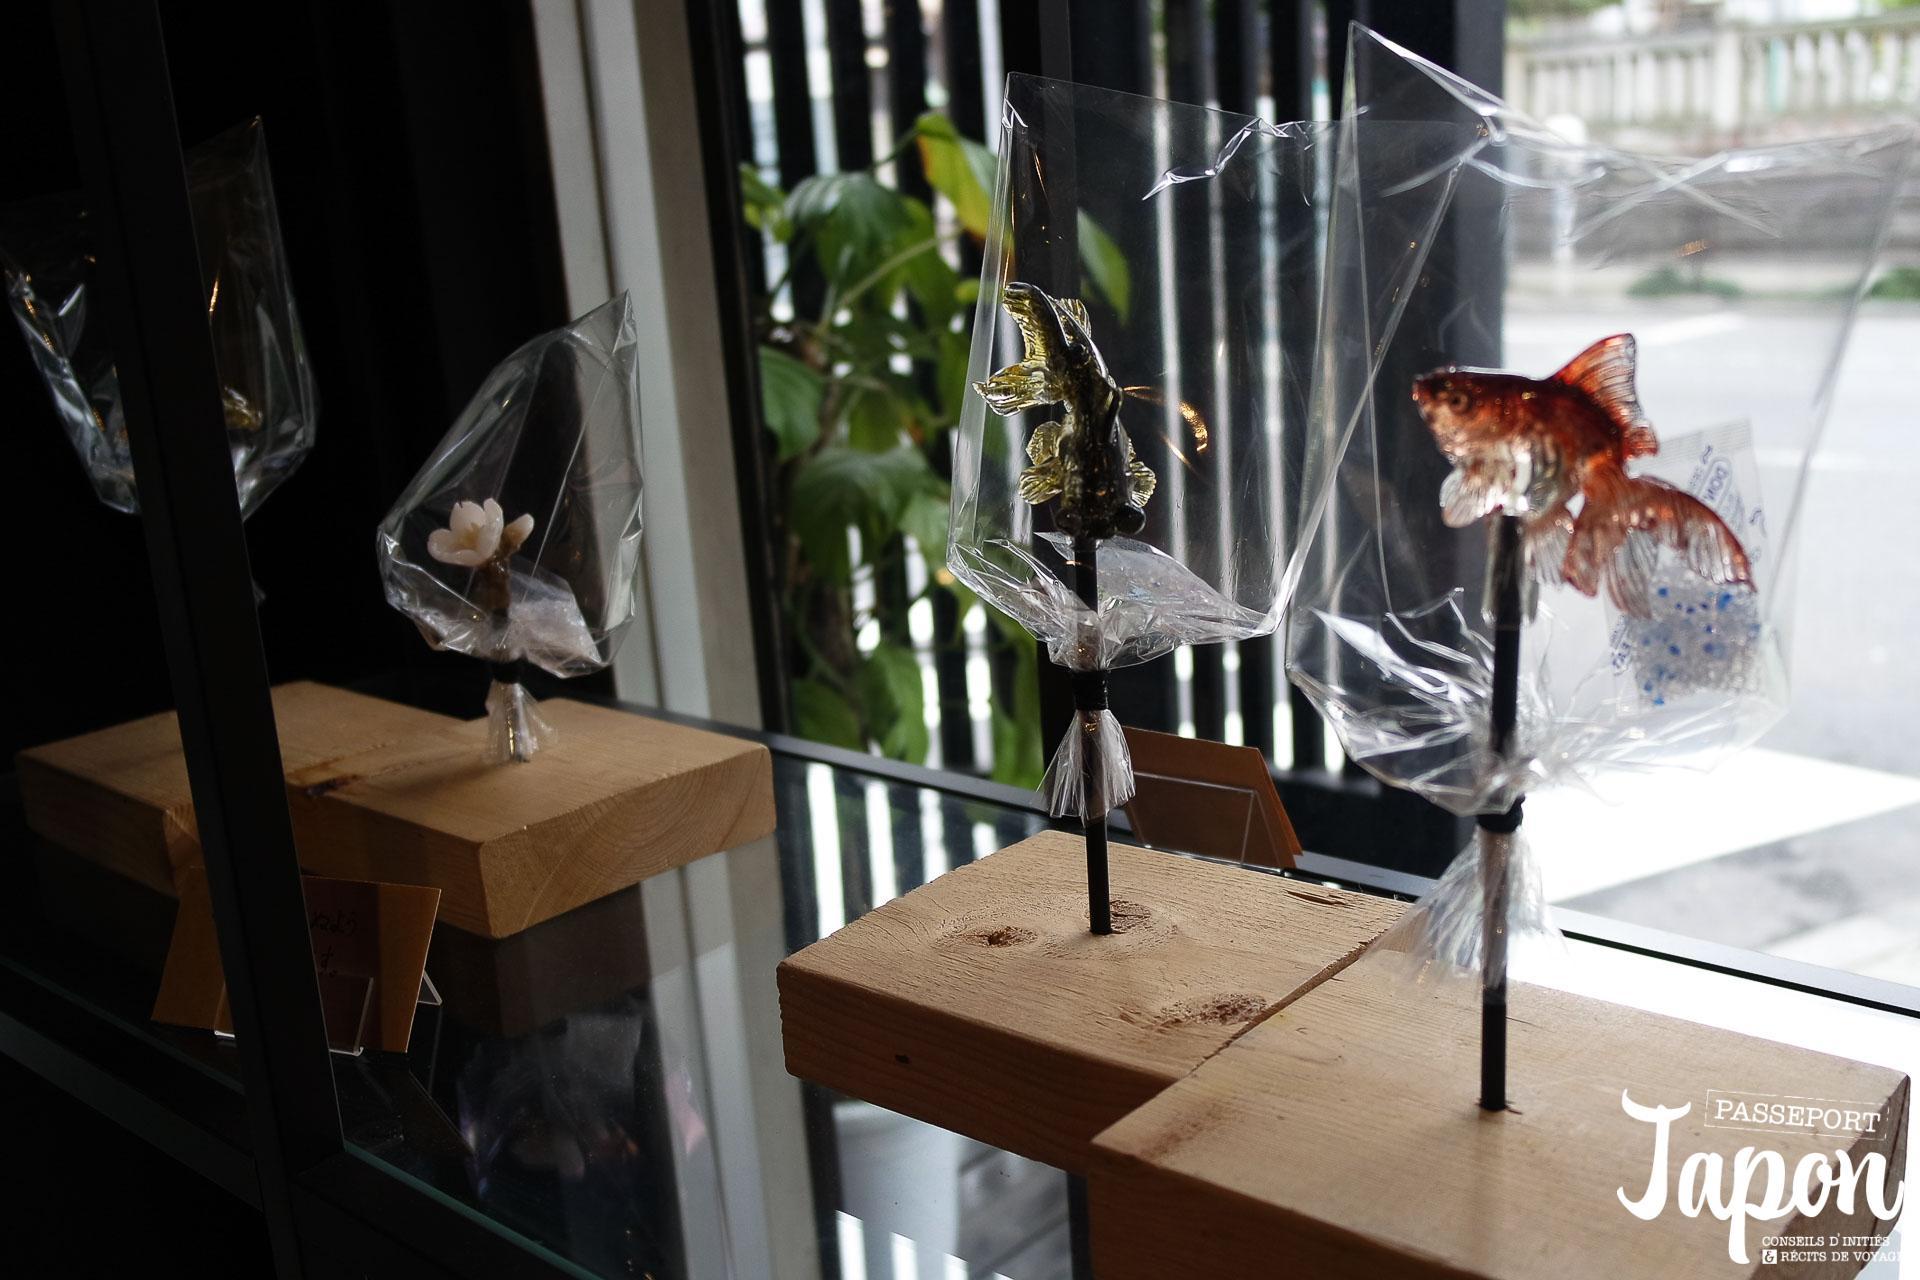 azakusa-amezaiku-ameshin-atelier-creations-originales